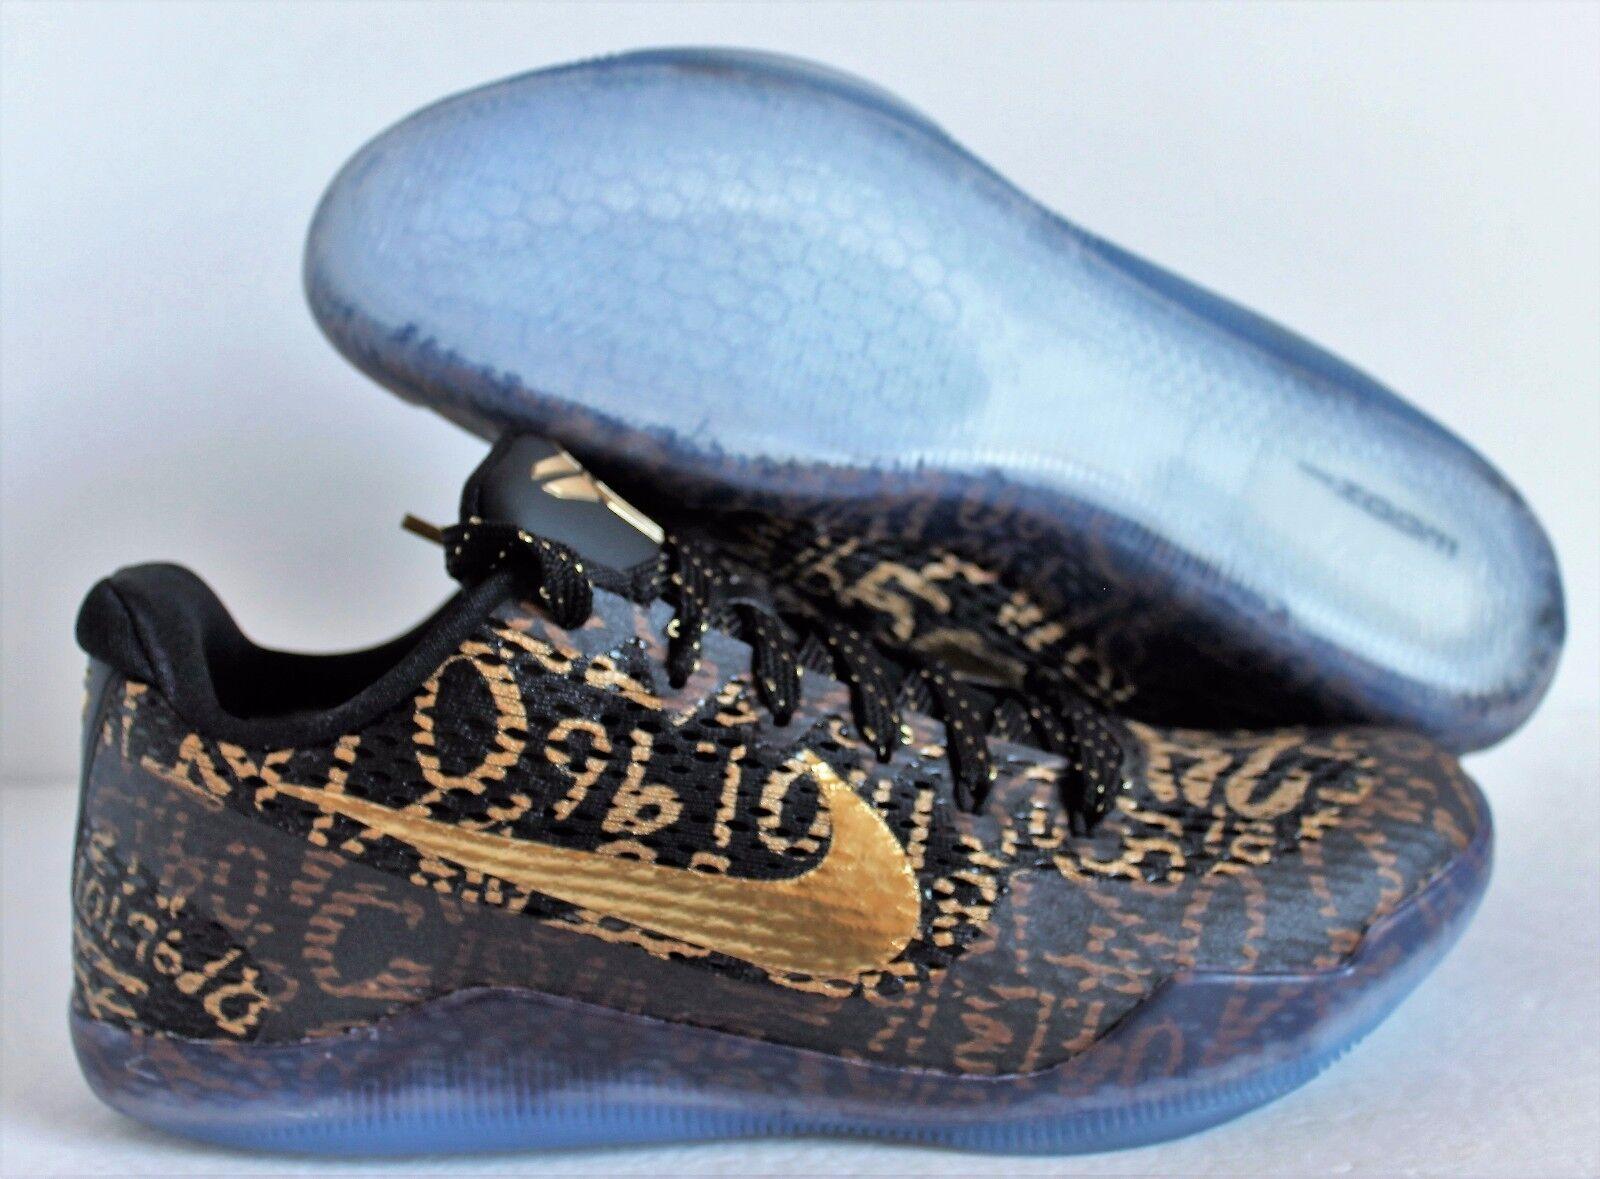 Nike Kobe XI 11 9.5 ID MAMBA NegroOro Tamaño DAY 9.5 11 [865773991] d0d6b3